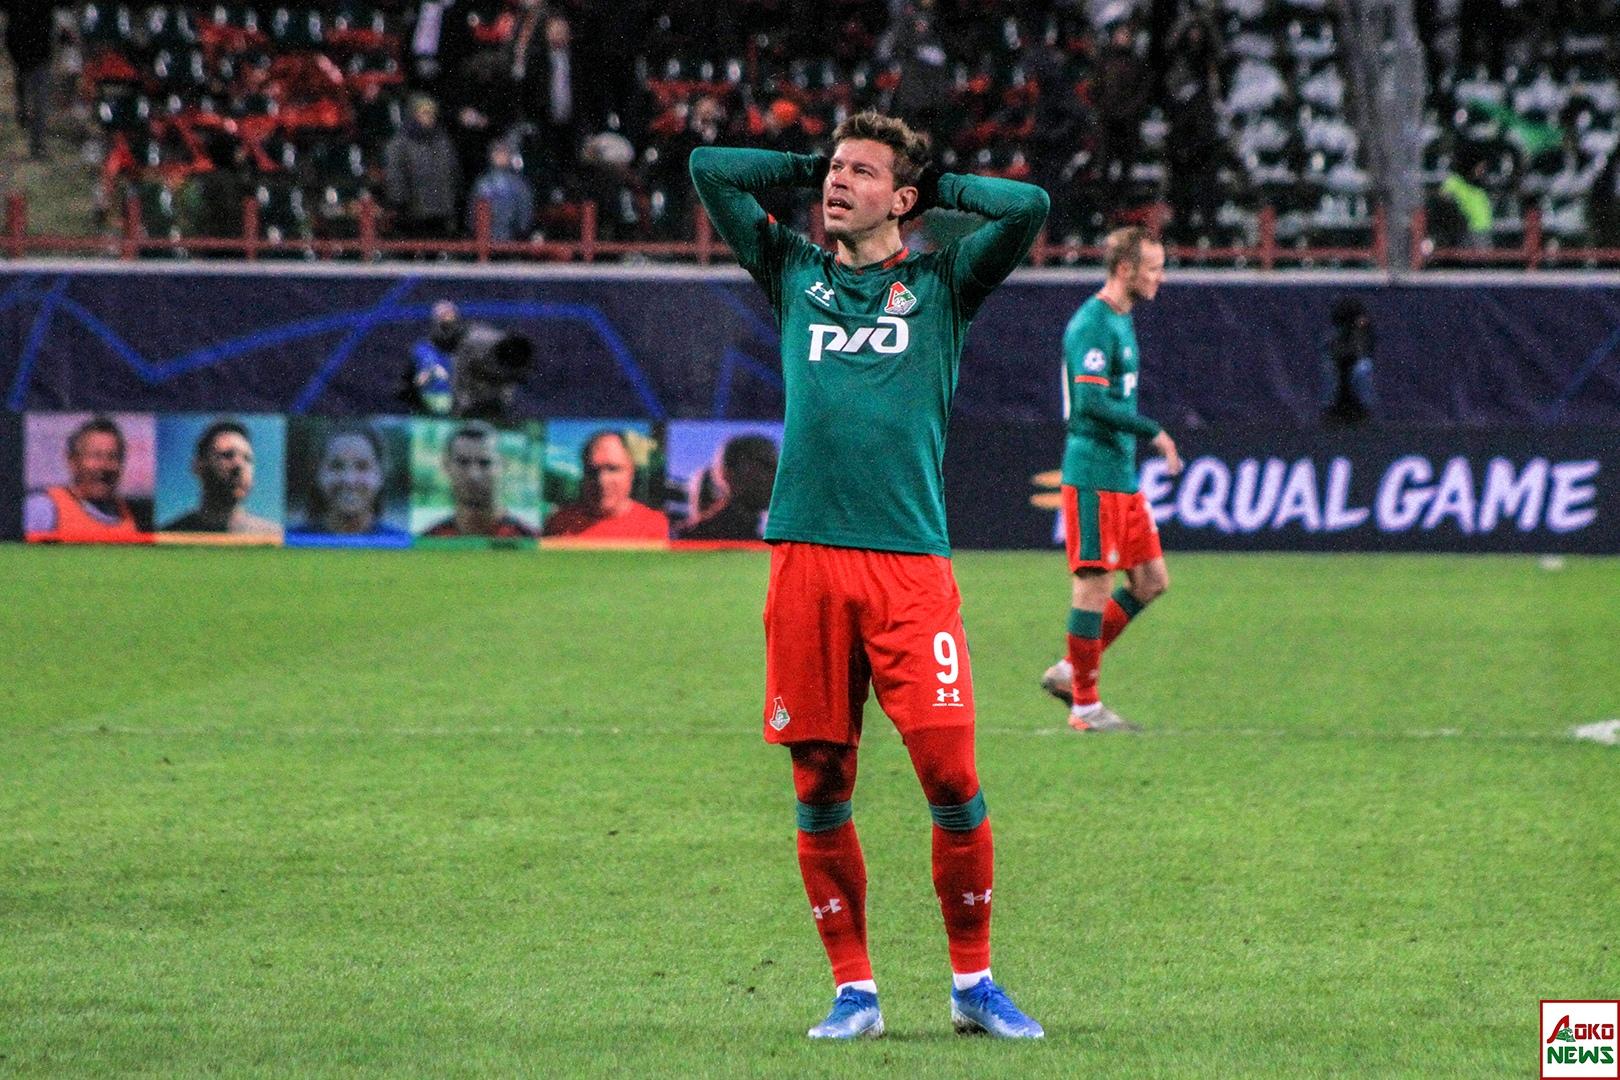 Локомотив - Леверкузен. Фото: Дмитрий Бурдонов / Loko.News